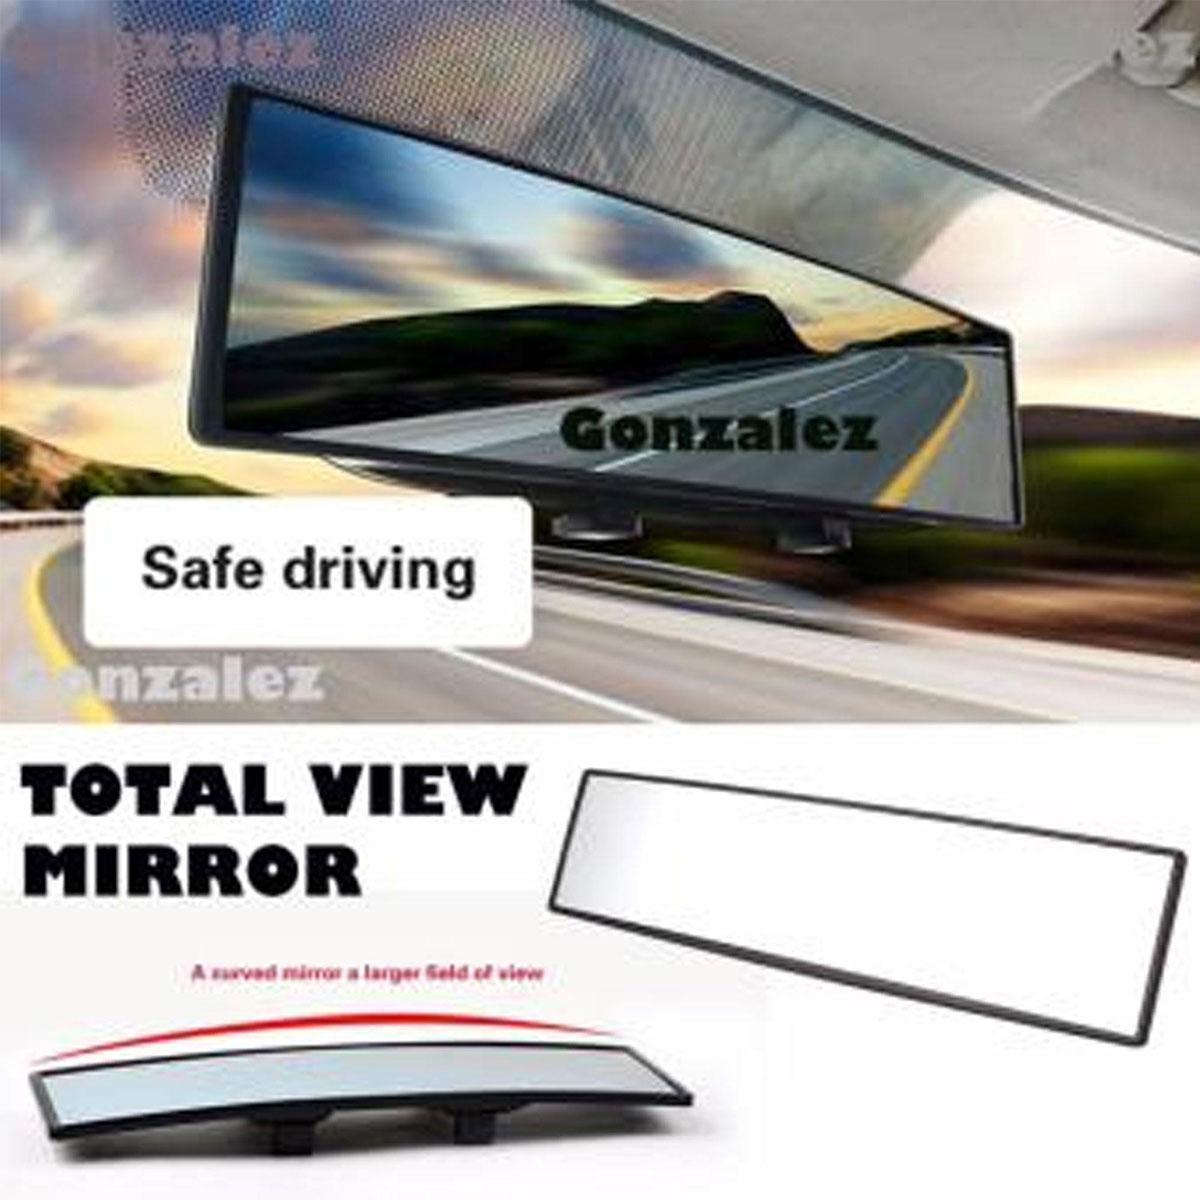 Universal Total Wide Curve View Car Rear Mirror By Gonzalez General Merchandise.